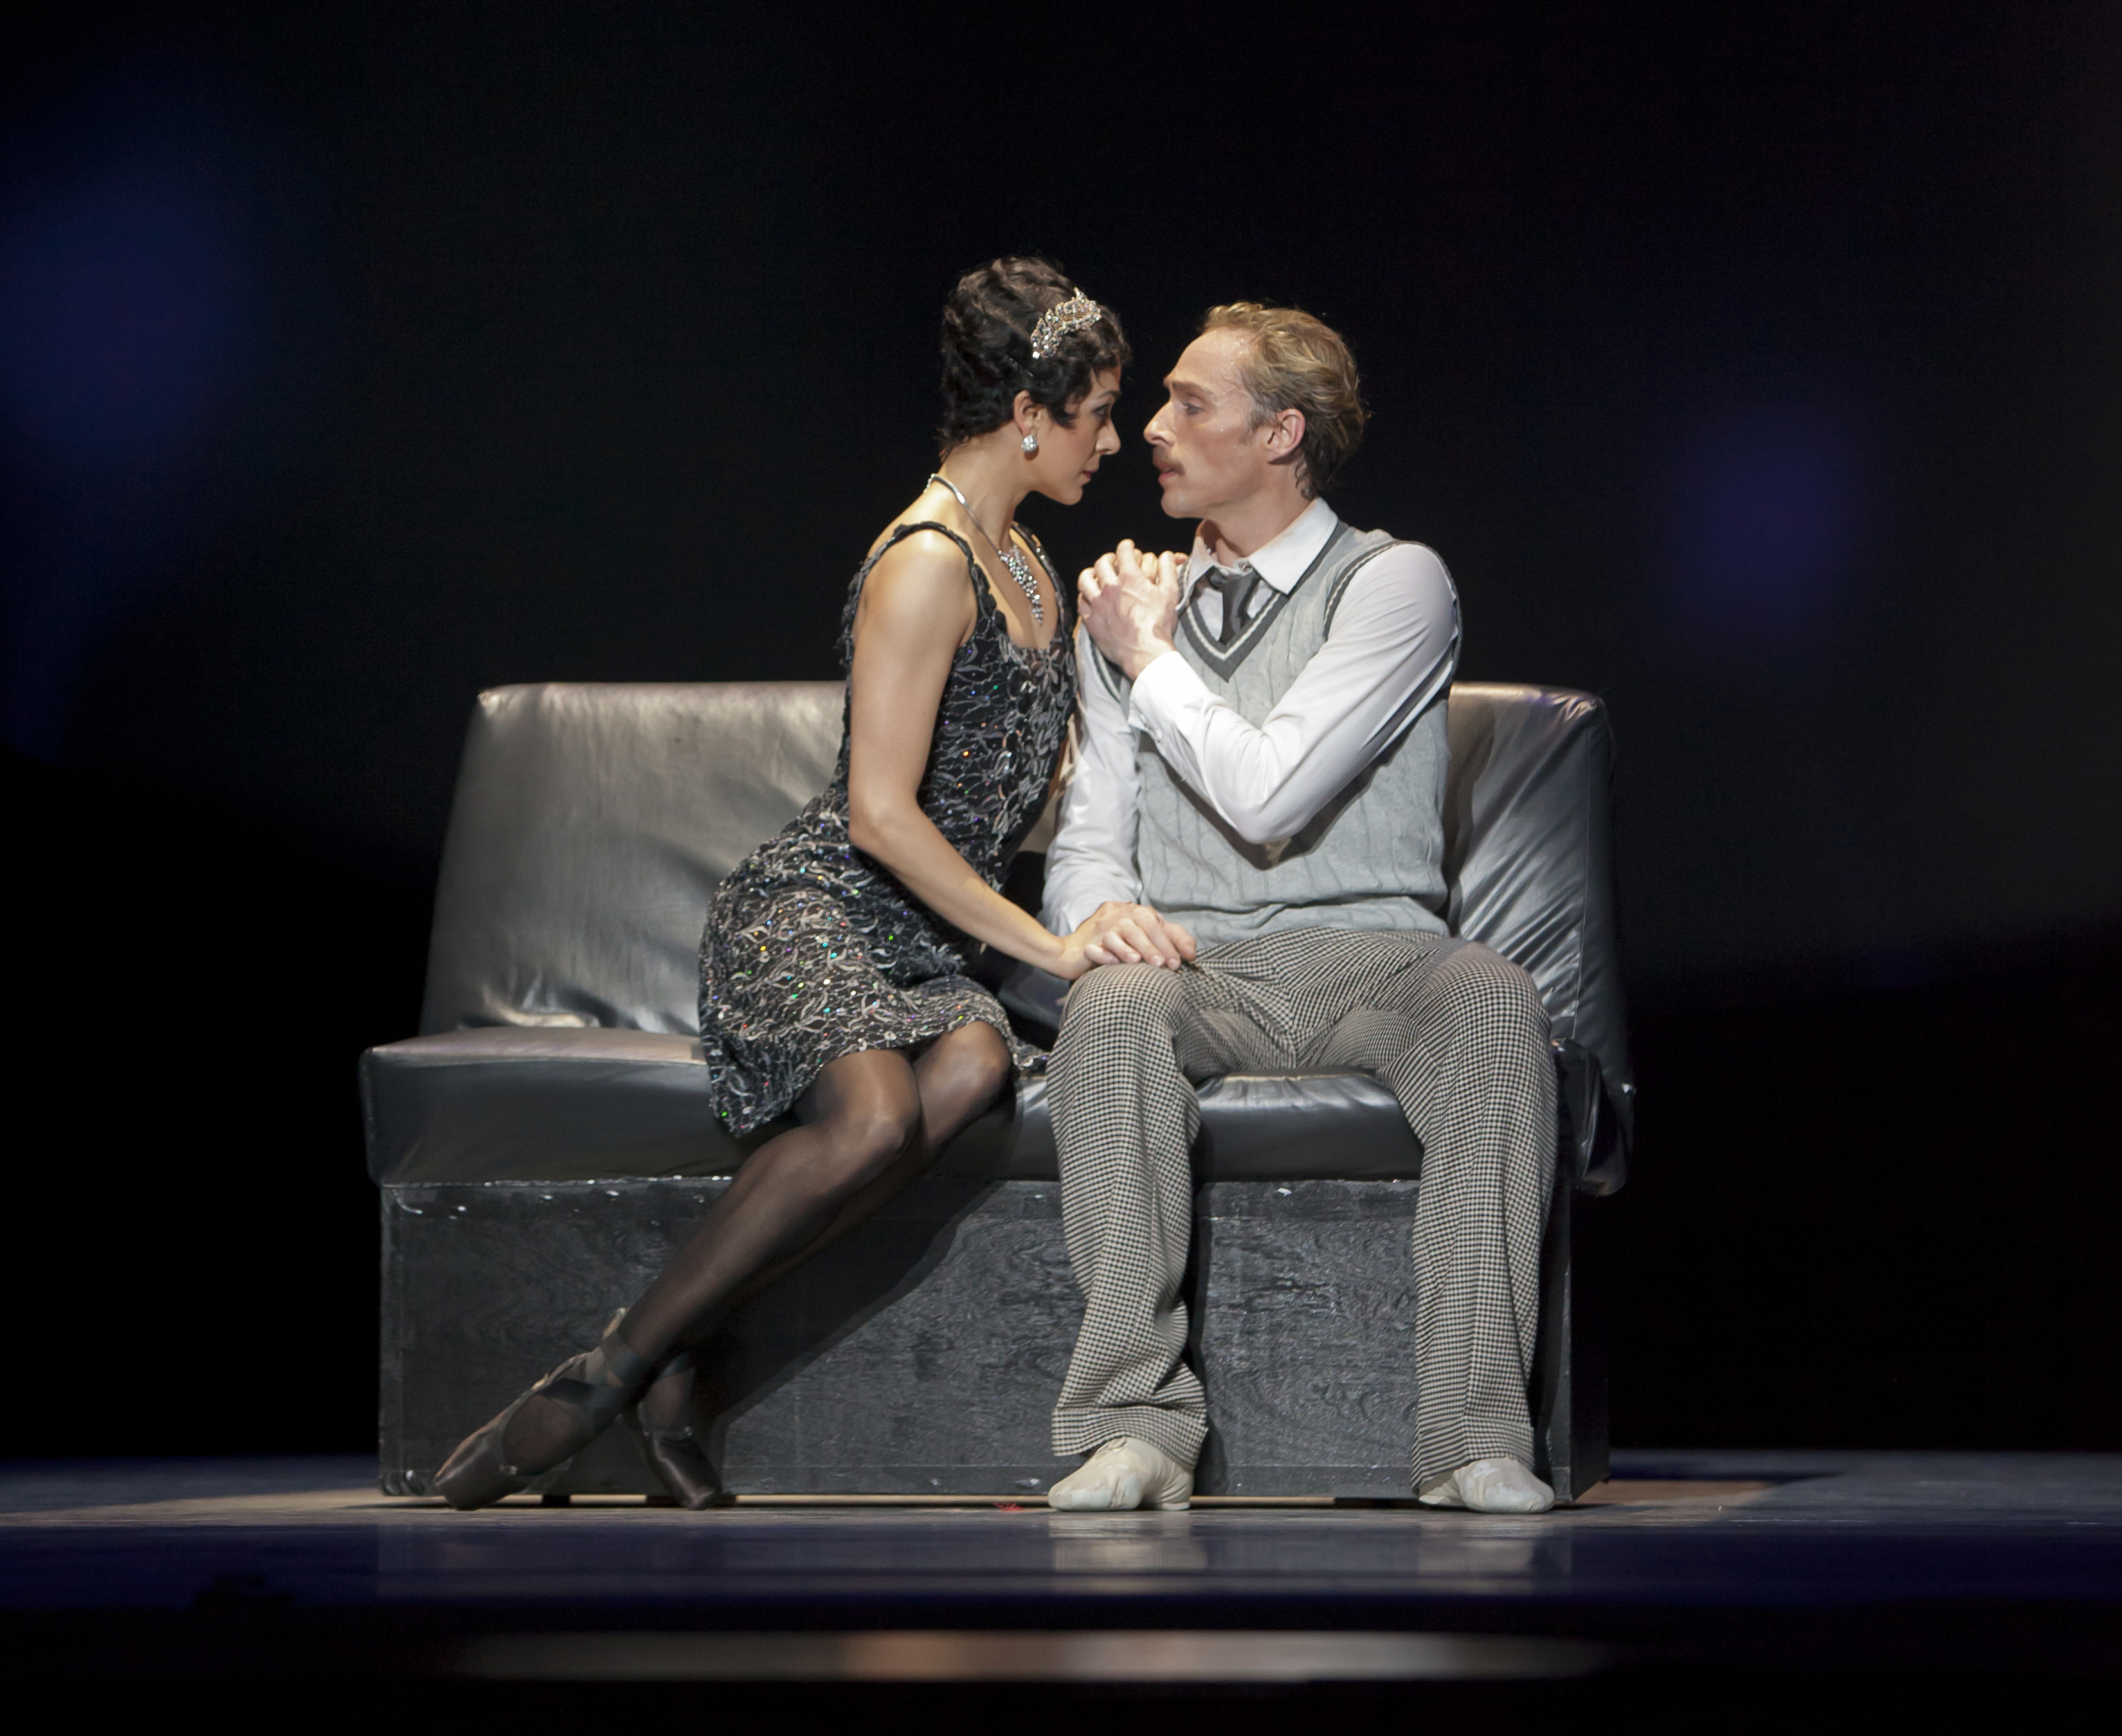 Washington Ballet performs sensual interpretation of classic Hemingway novel